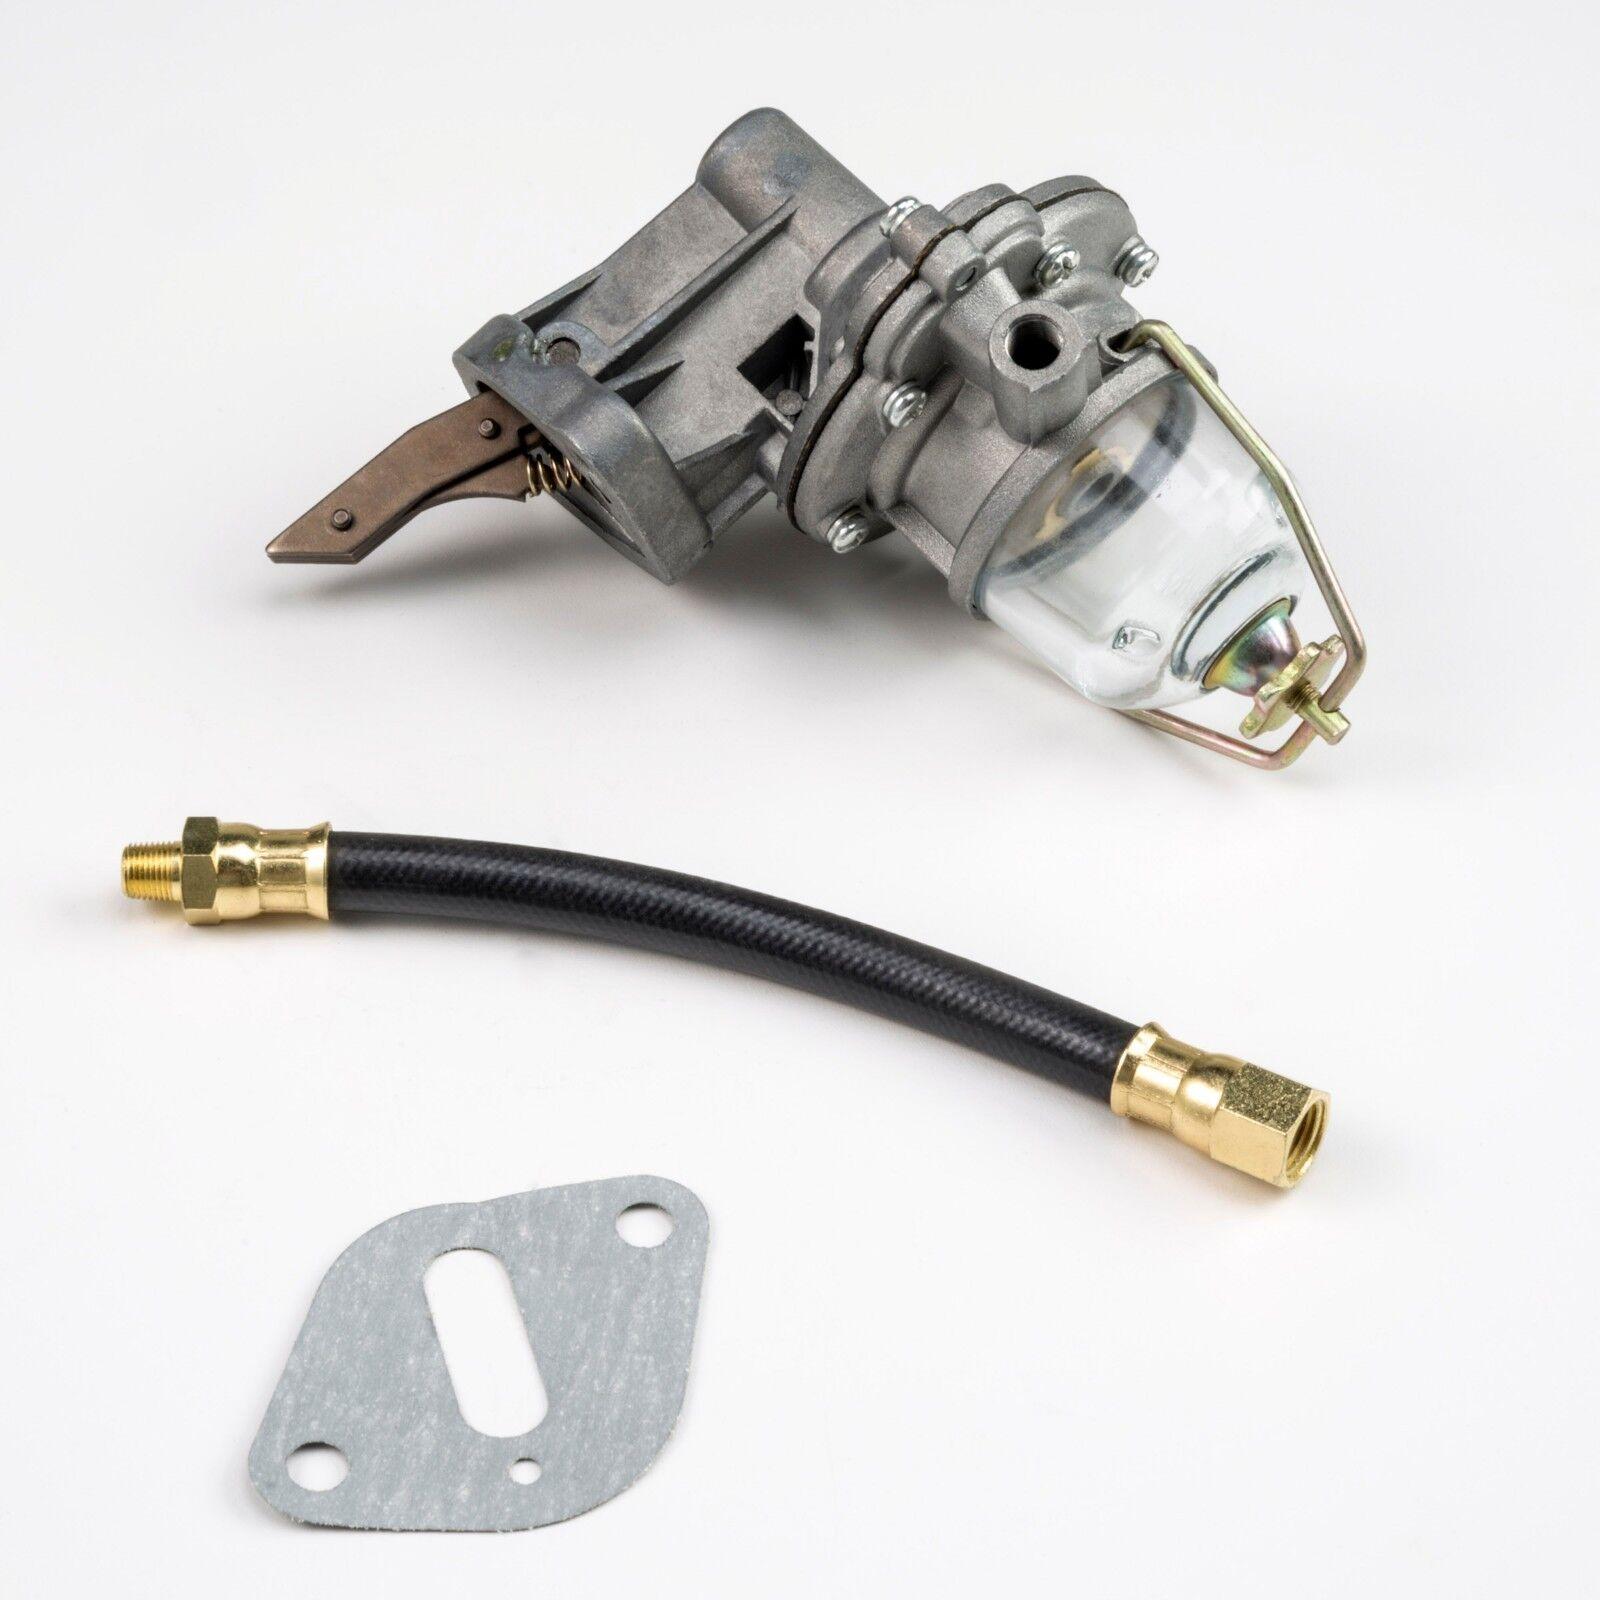 37 38 39 40 41 42 46 47 Chrysler Desoto Dodge Plymouth flexible fuel line